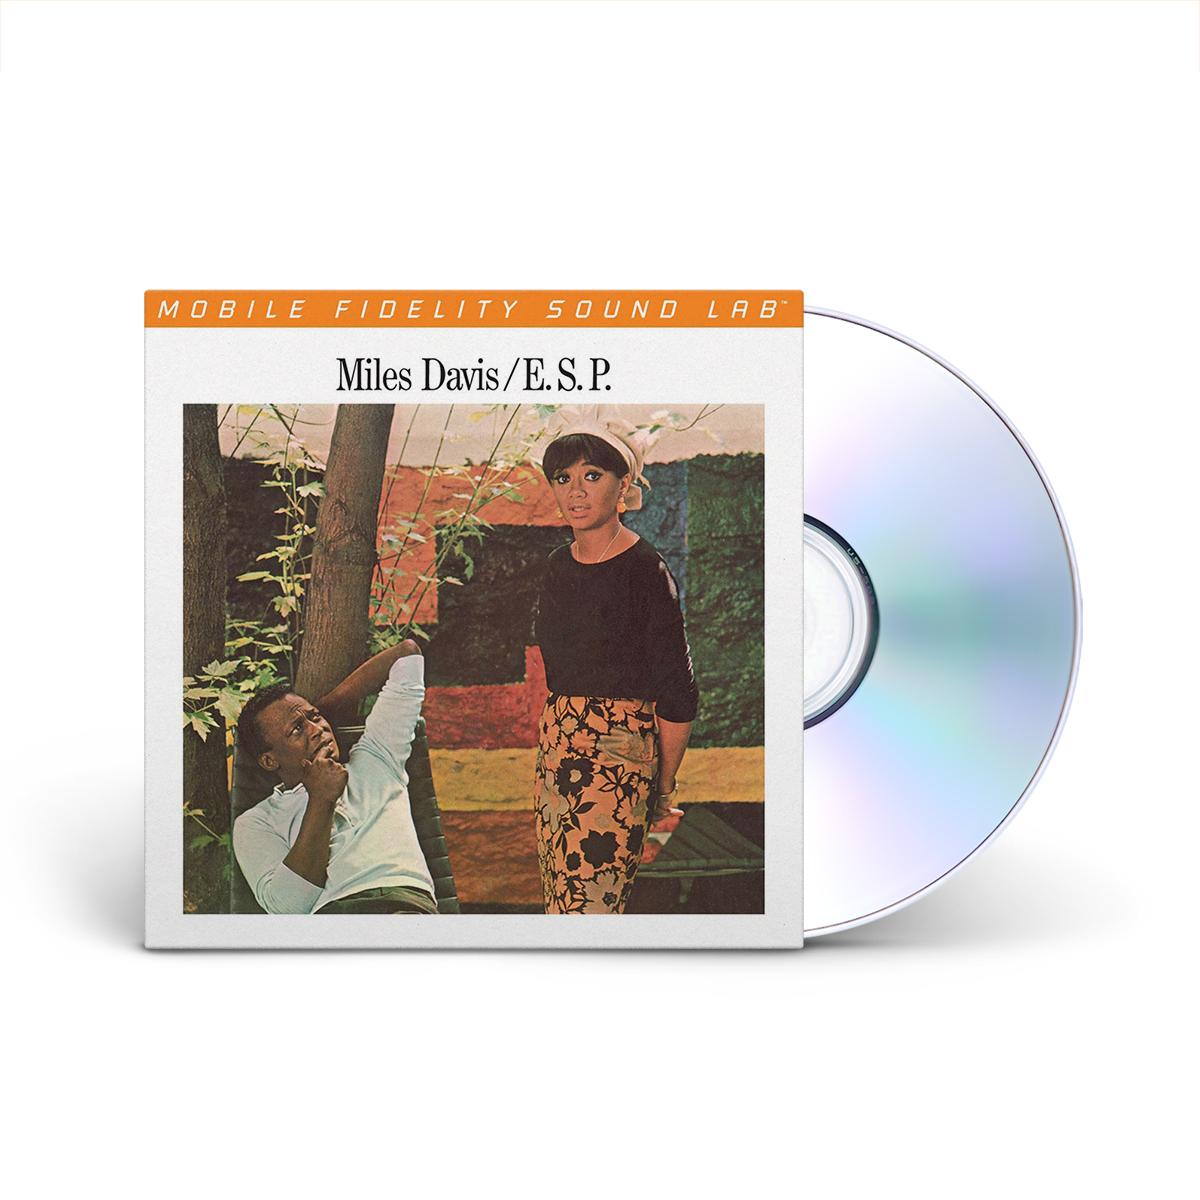 Miles Davis - E.S.P. (Numbered Hybrid SACD)